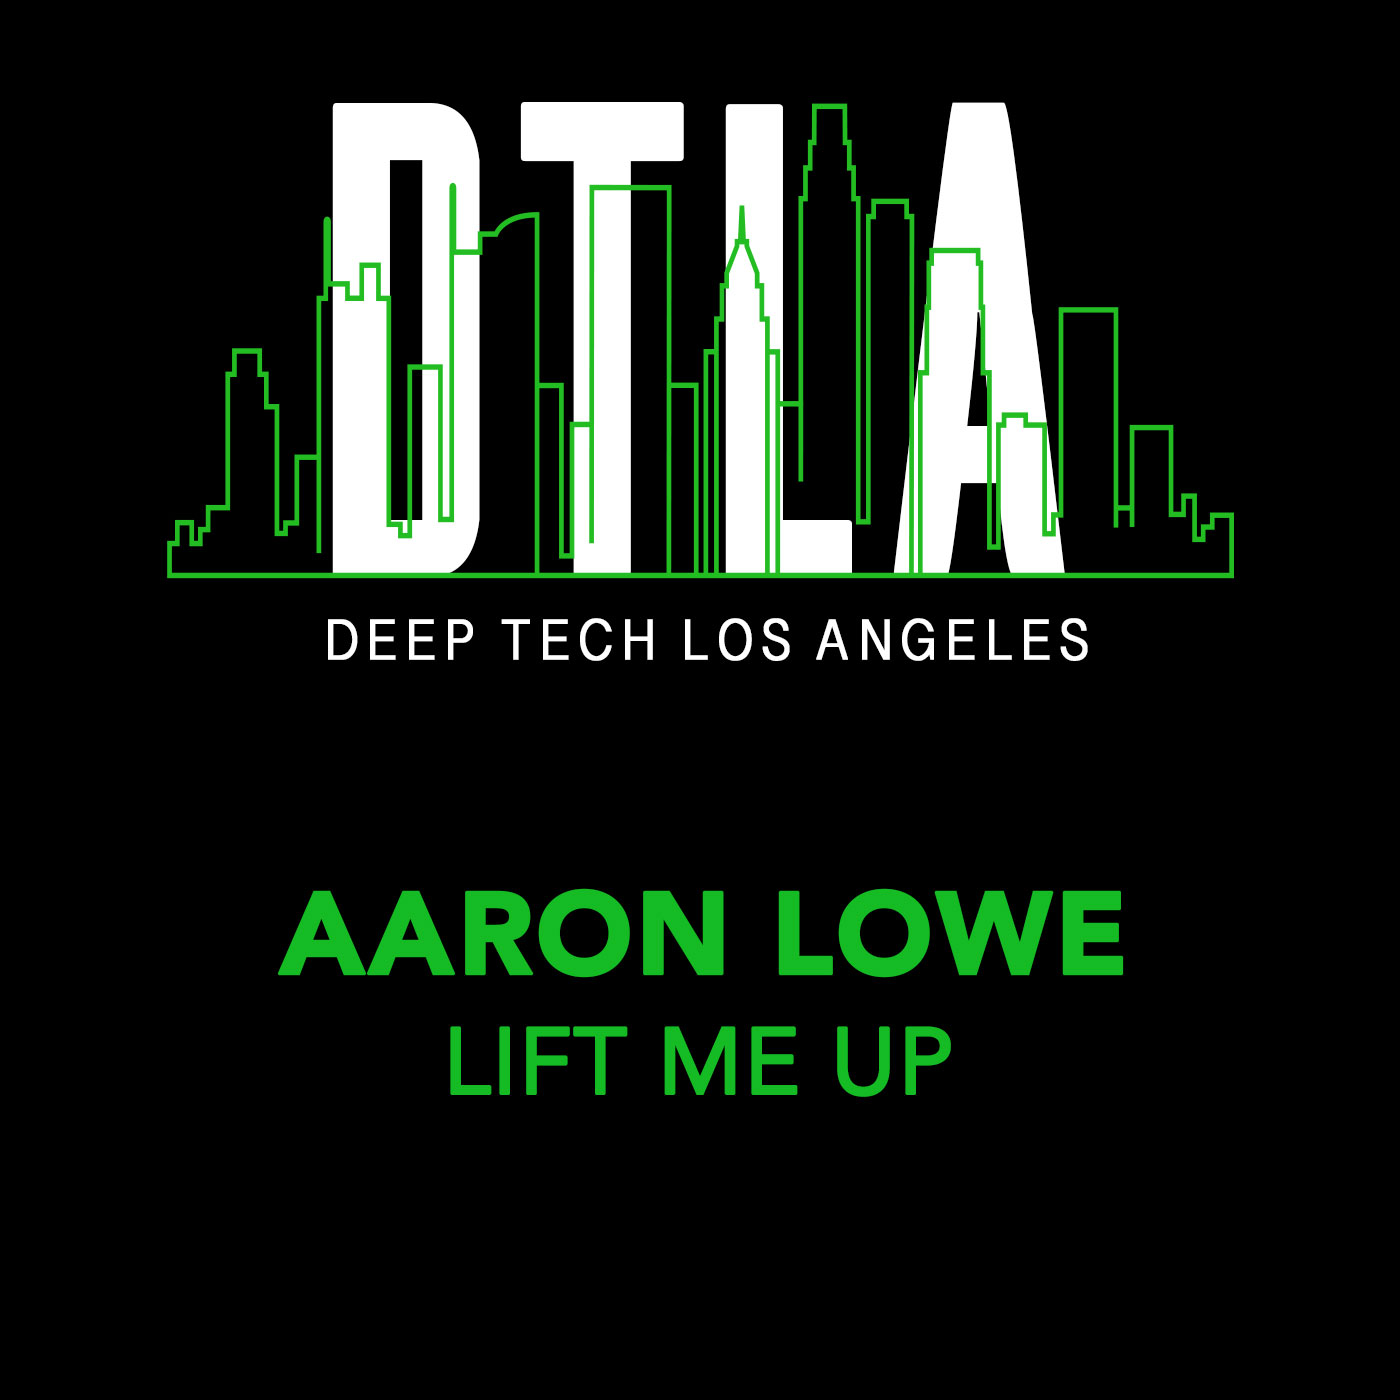 Deep Tech LA - Lift Me Up